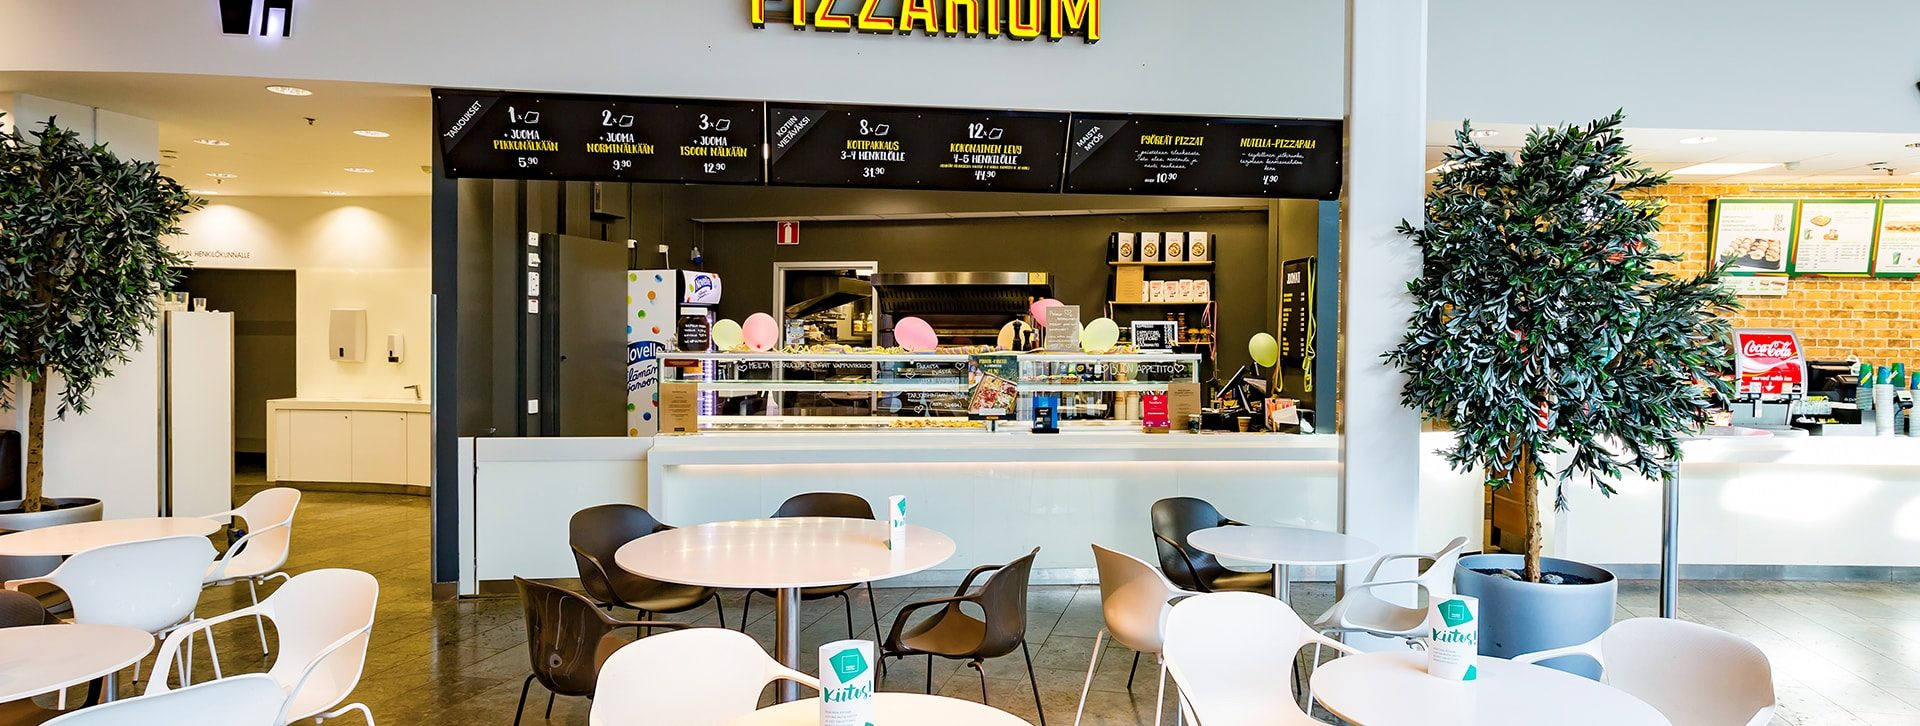 hansakortteli_pizzarium